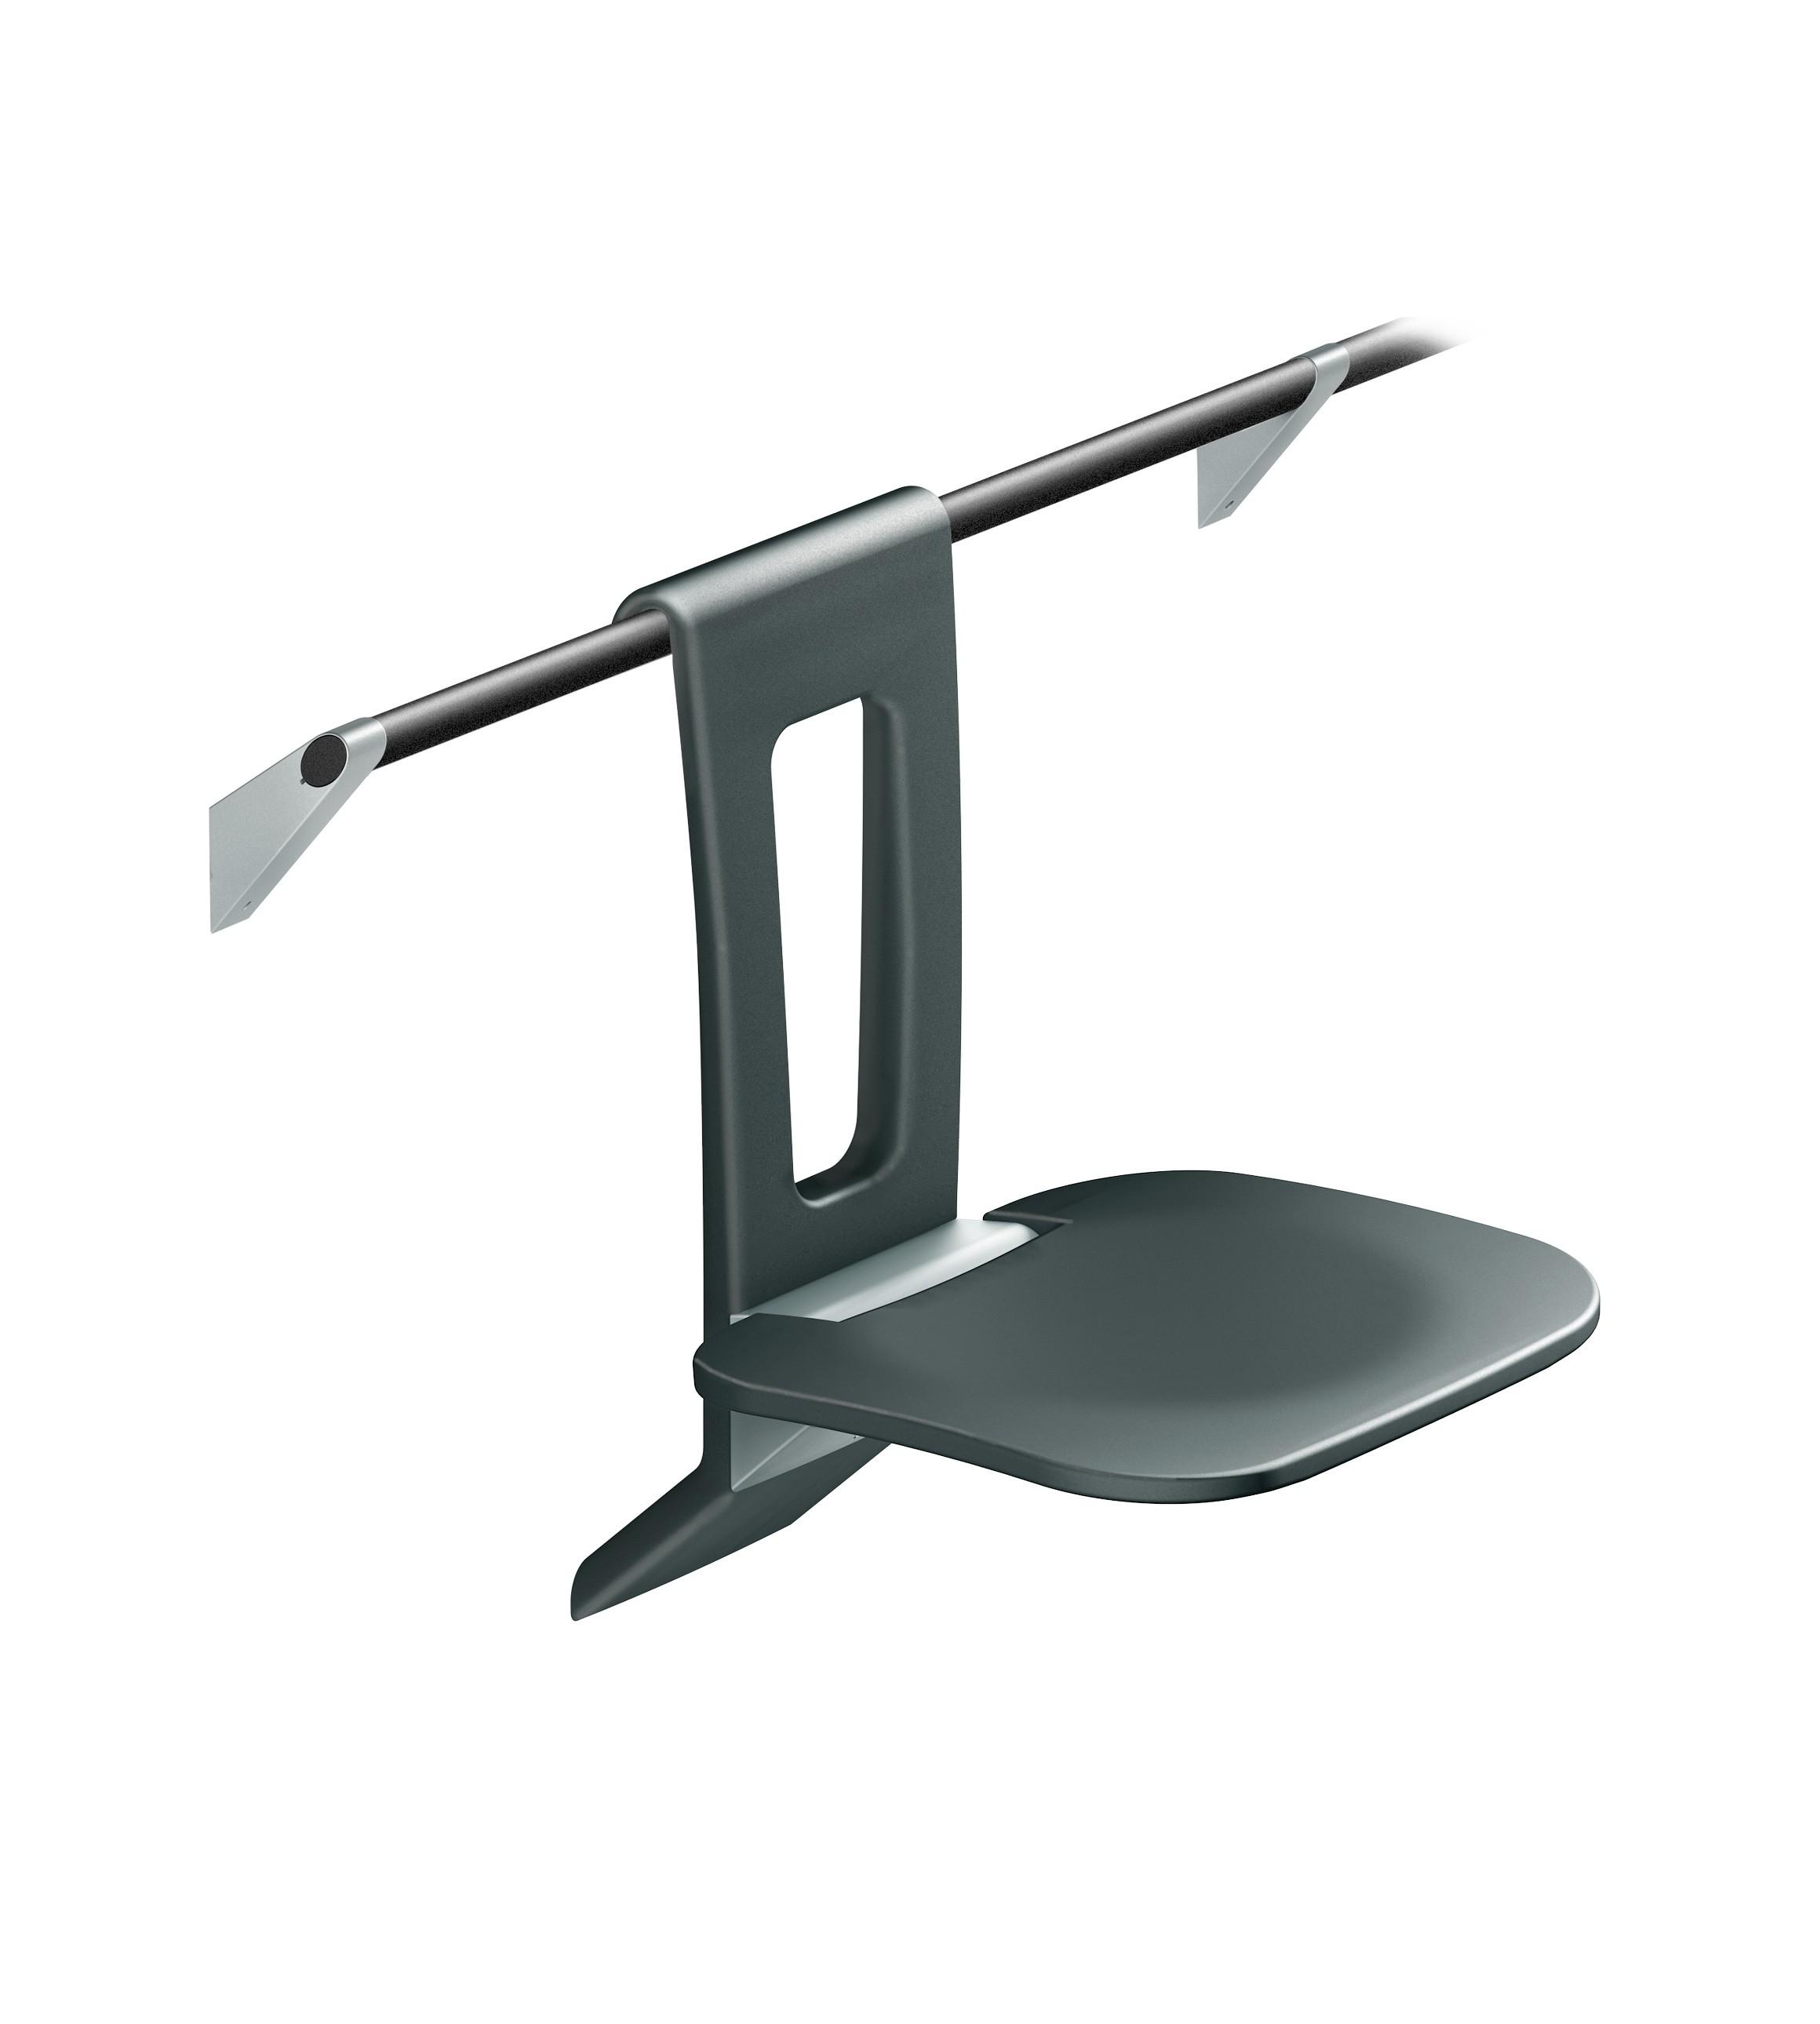 FSB Einhängesitz min A100 Sitz 381x368 mm Graphitgrau / Aluminiumgrau metallinksc(0 82 8450 10000 8837)